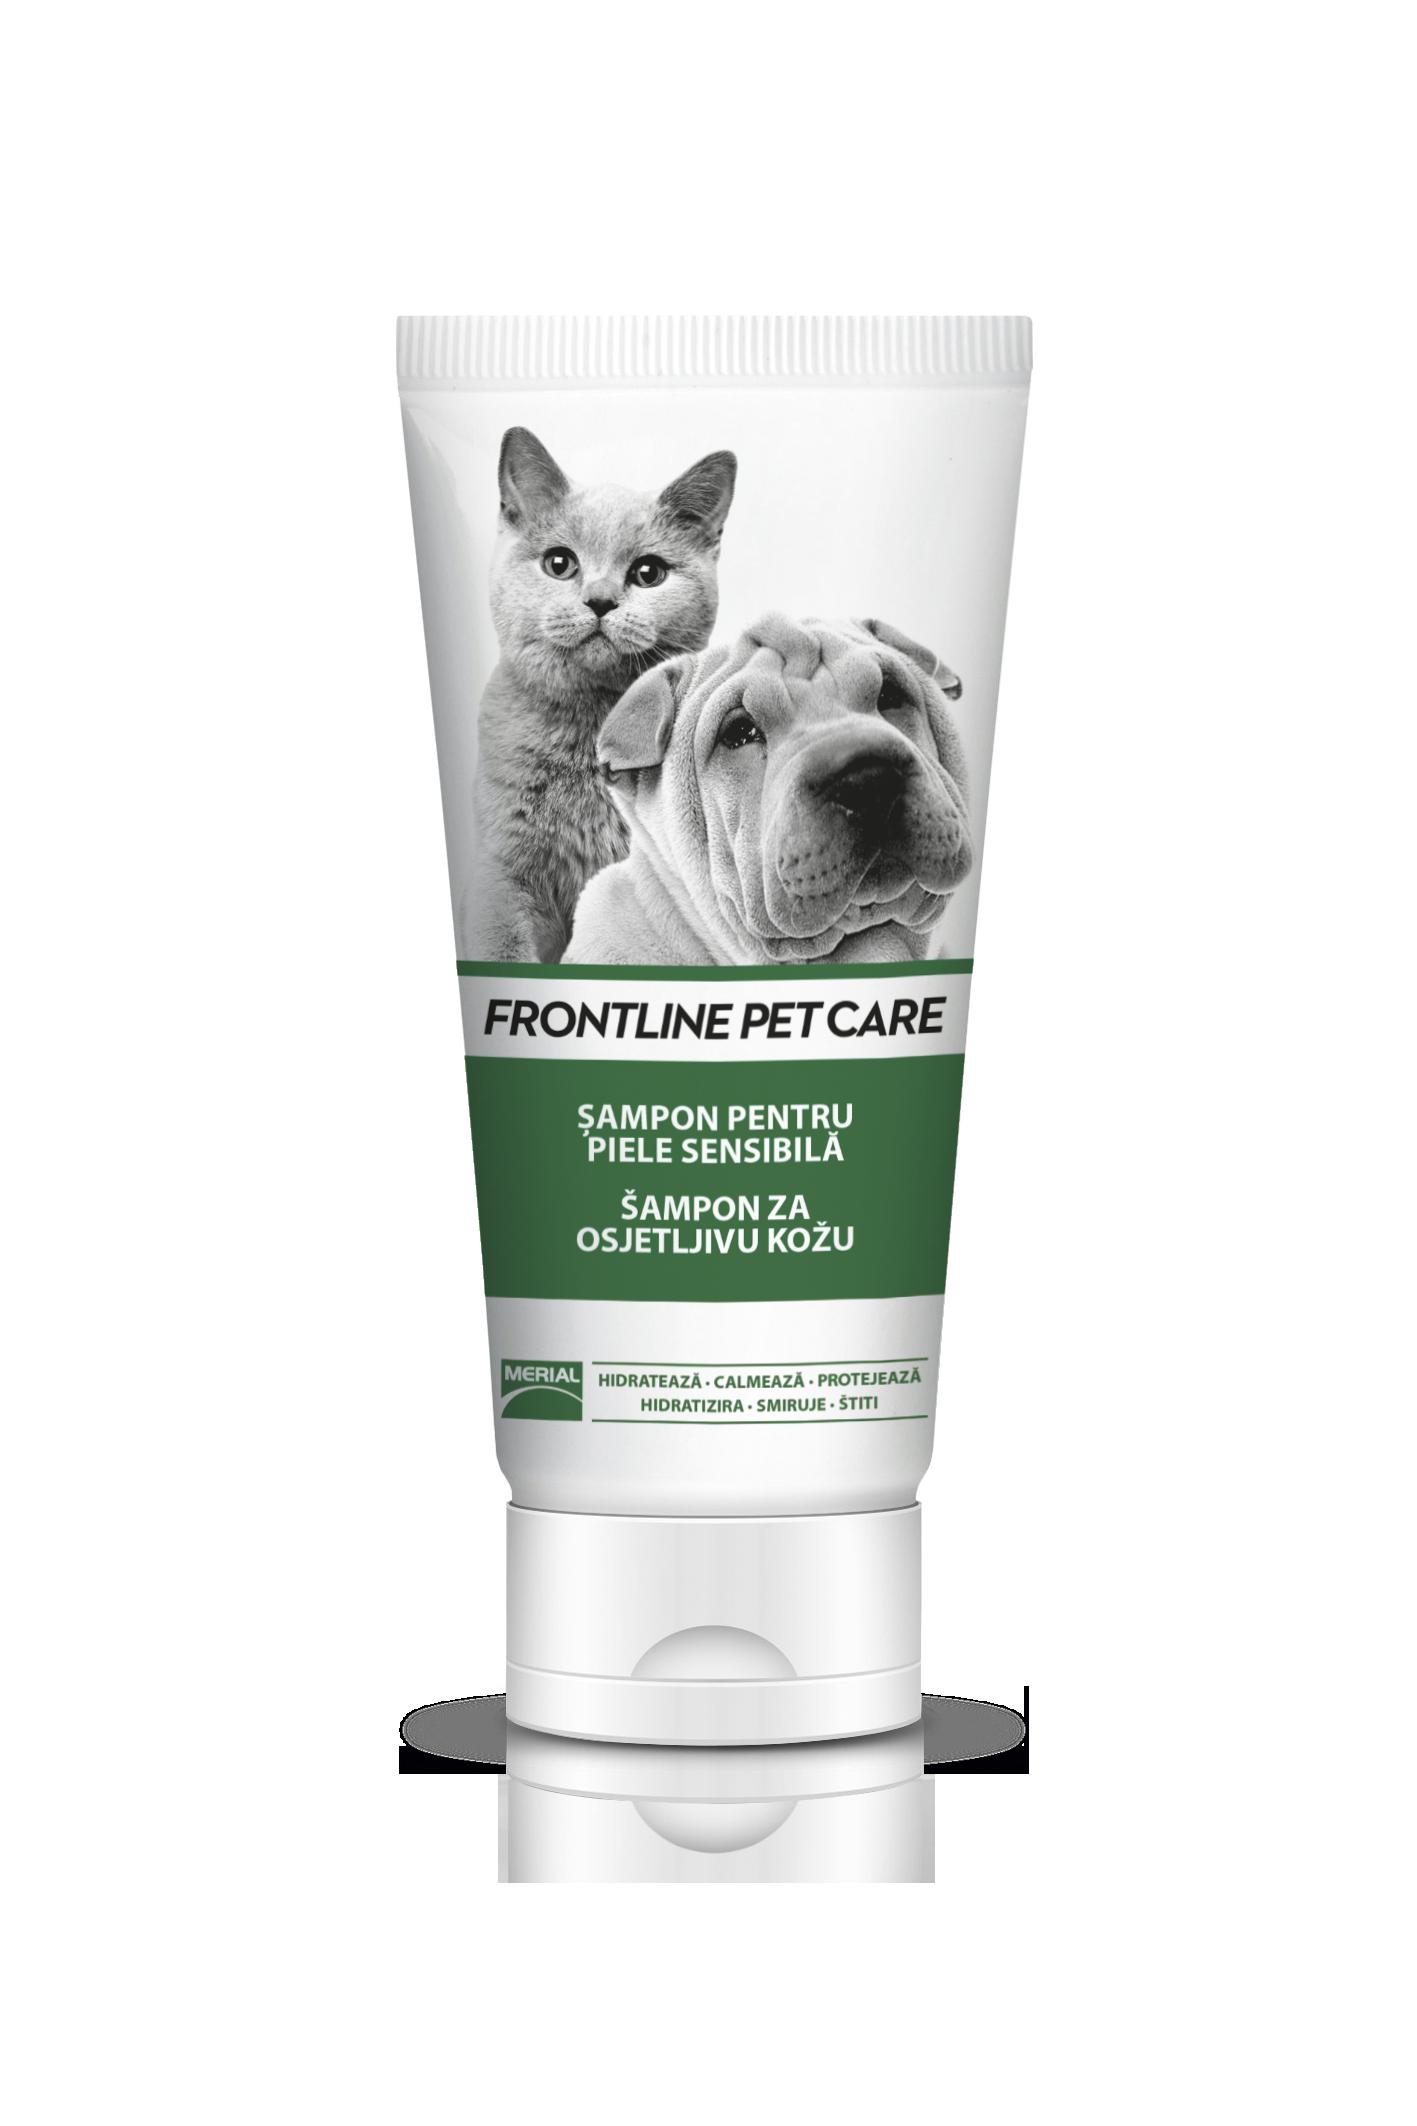 Frontline Pet Care SenSkin Shampoo, 200 ml imagine